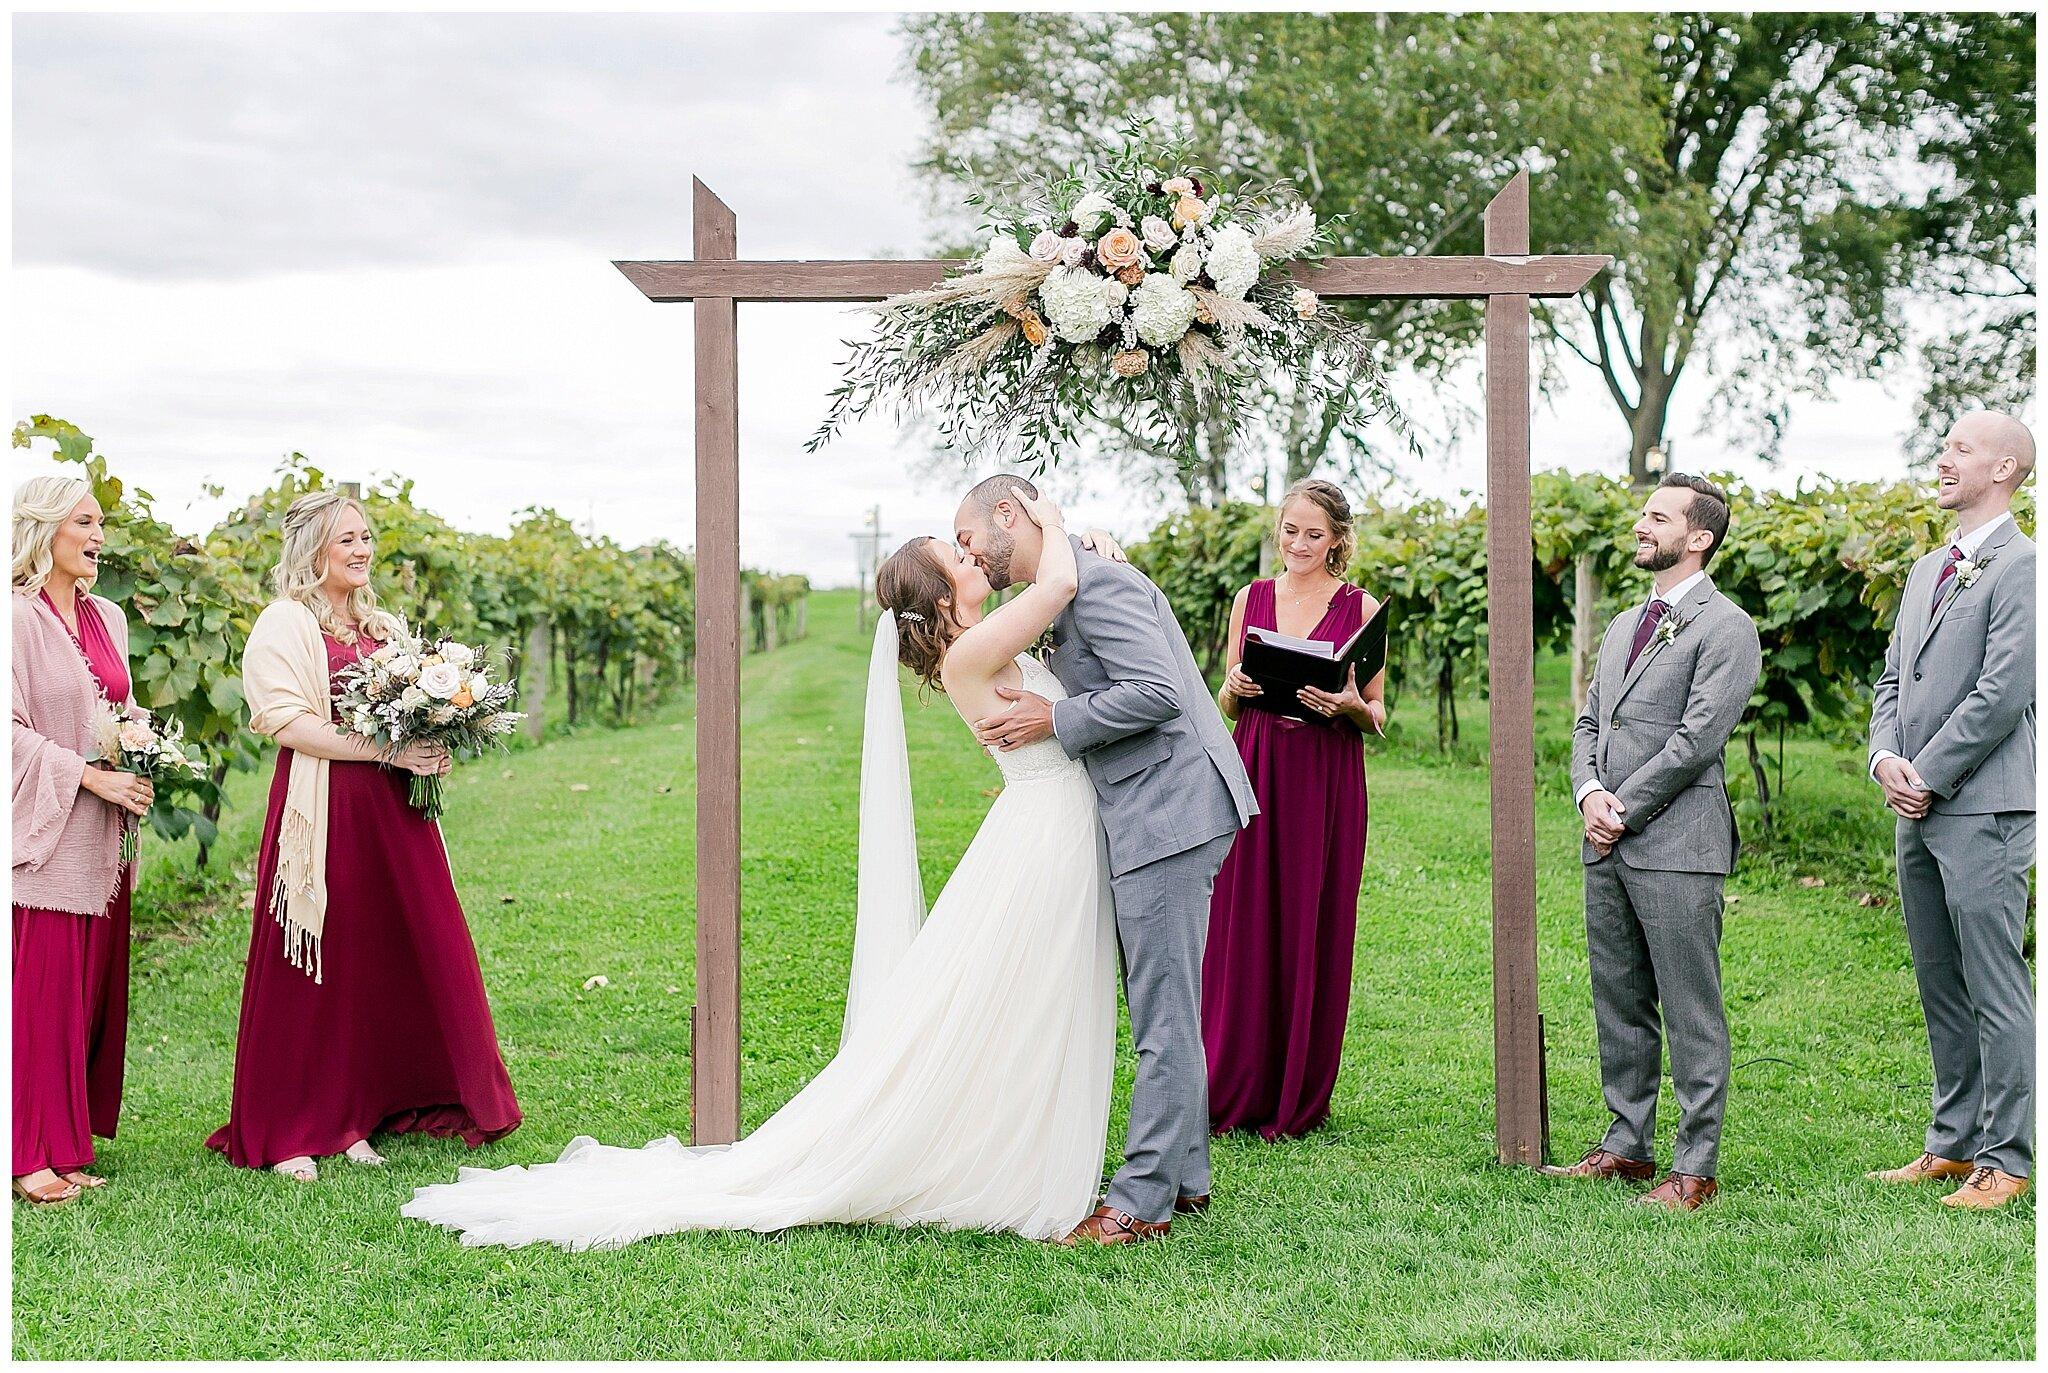 over_the_vines_edgerton_wisconsin_wedding_madison_wisconsin_photographer_0455.jpg